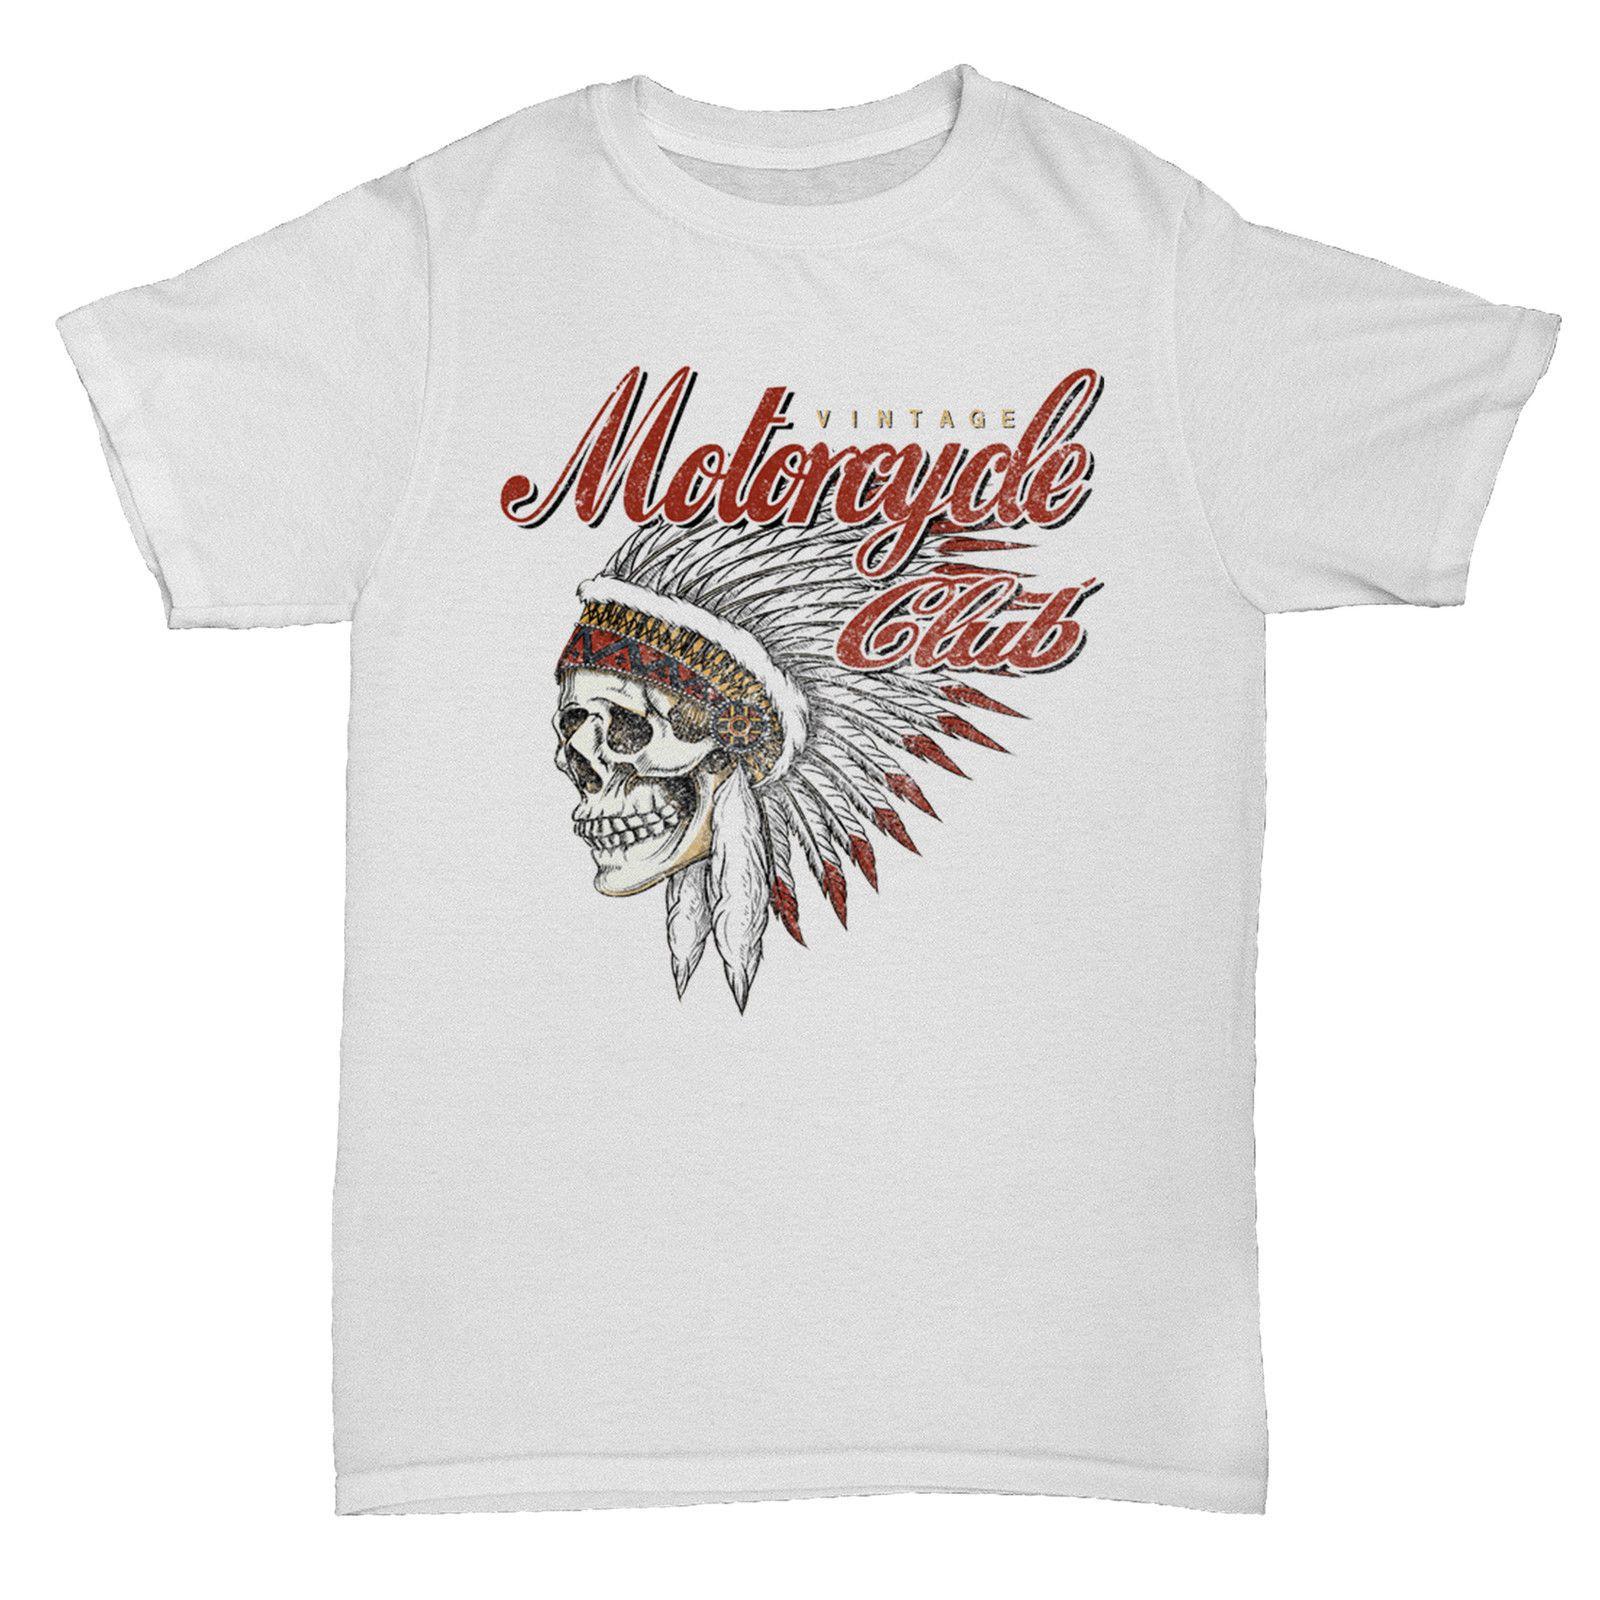 MOTORCYCLE CLUB INSPIRED BIKER SKULL INDIAN CULT 90S HOT ROD 2 T Shirt Men  s Clothing T-Shirts Tees Men Hot Cheap Short Sleeve